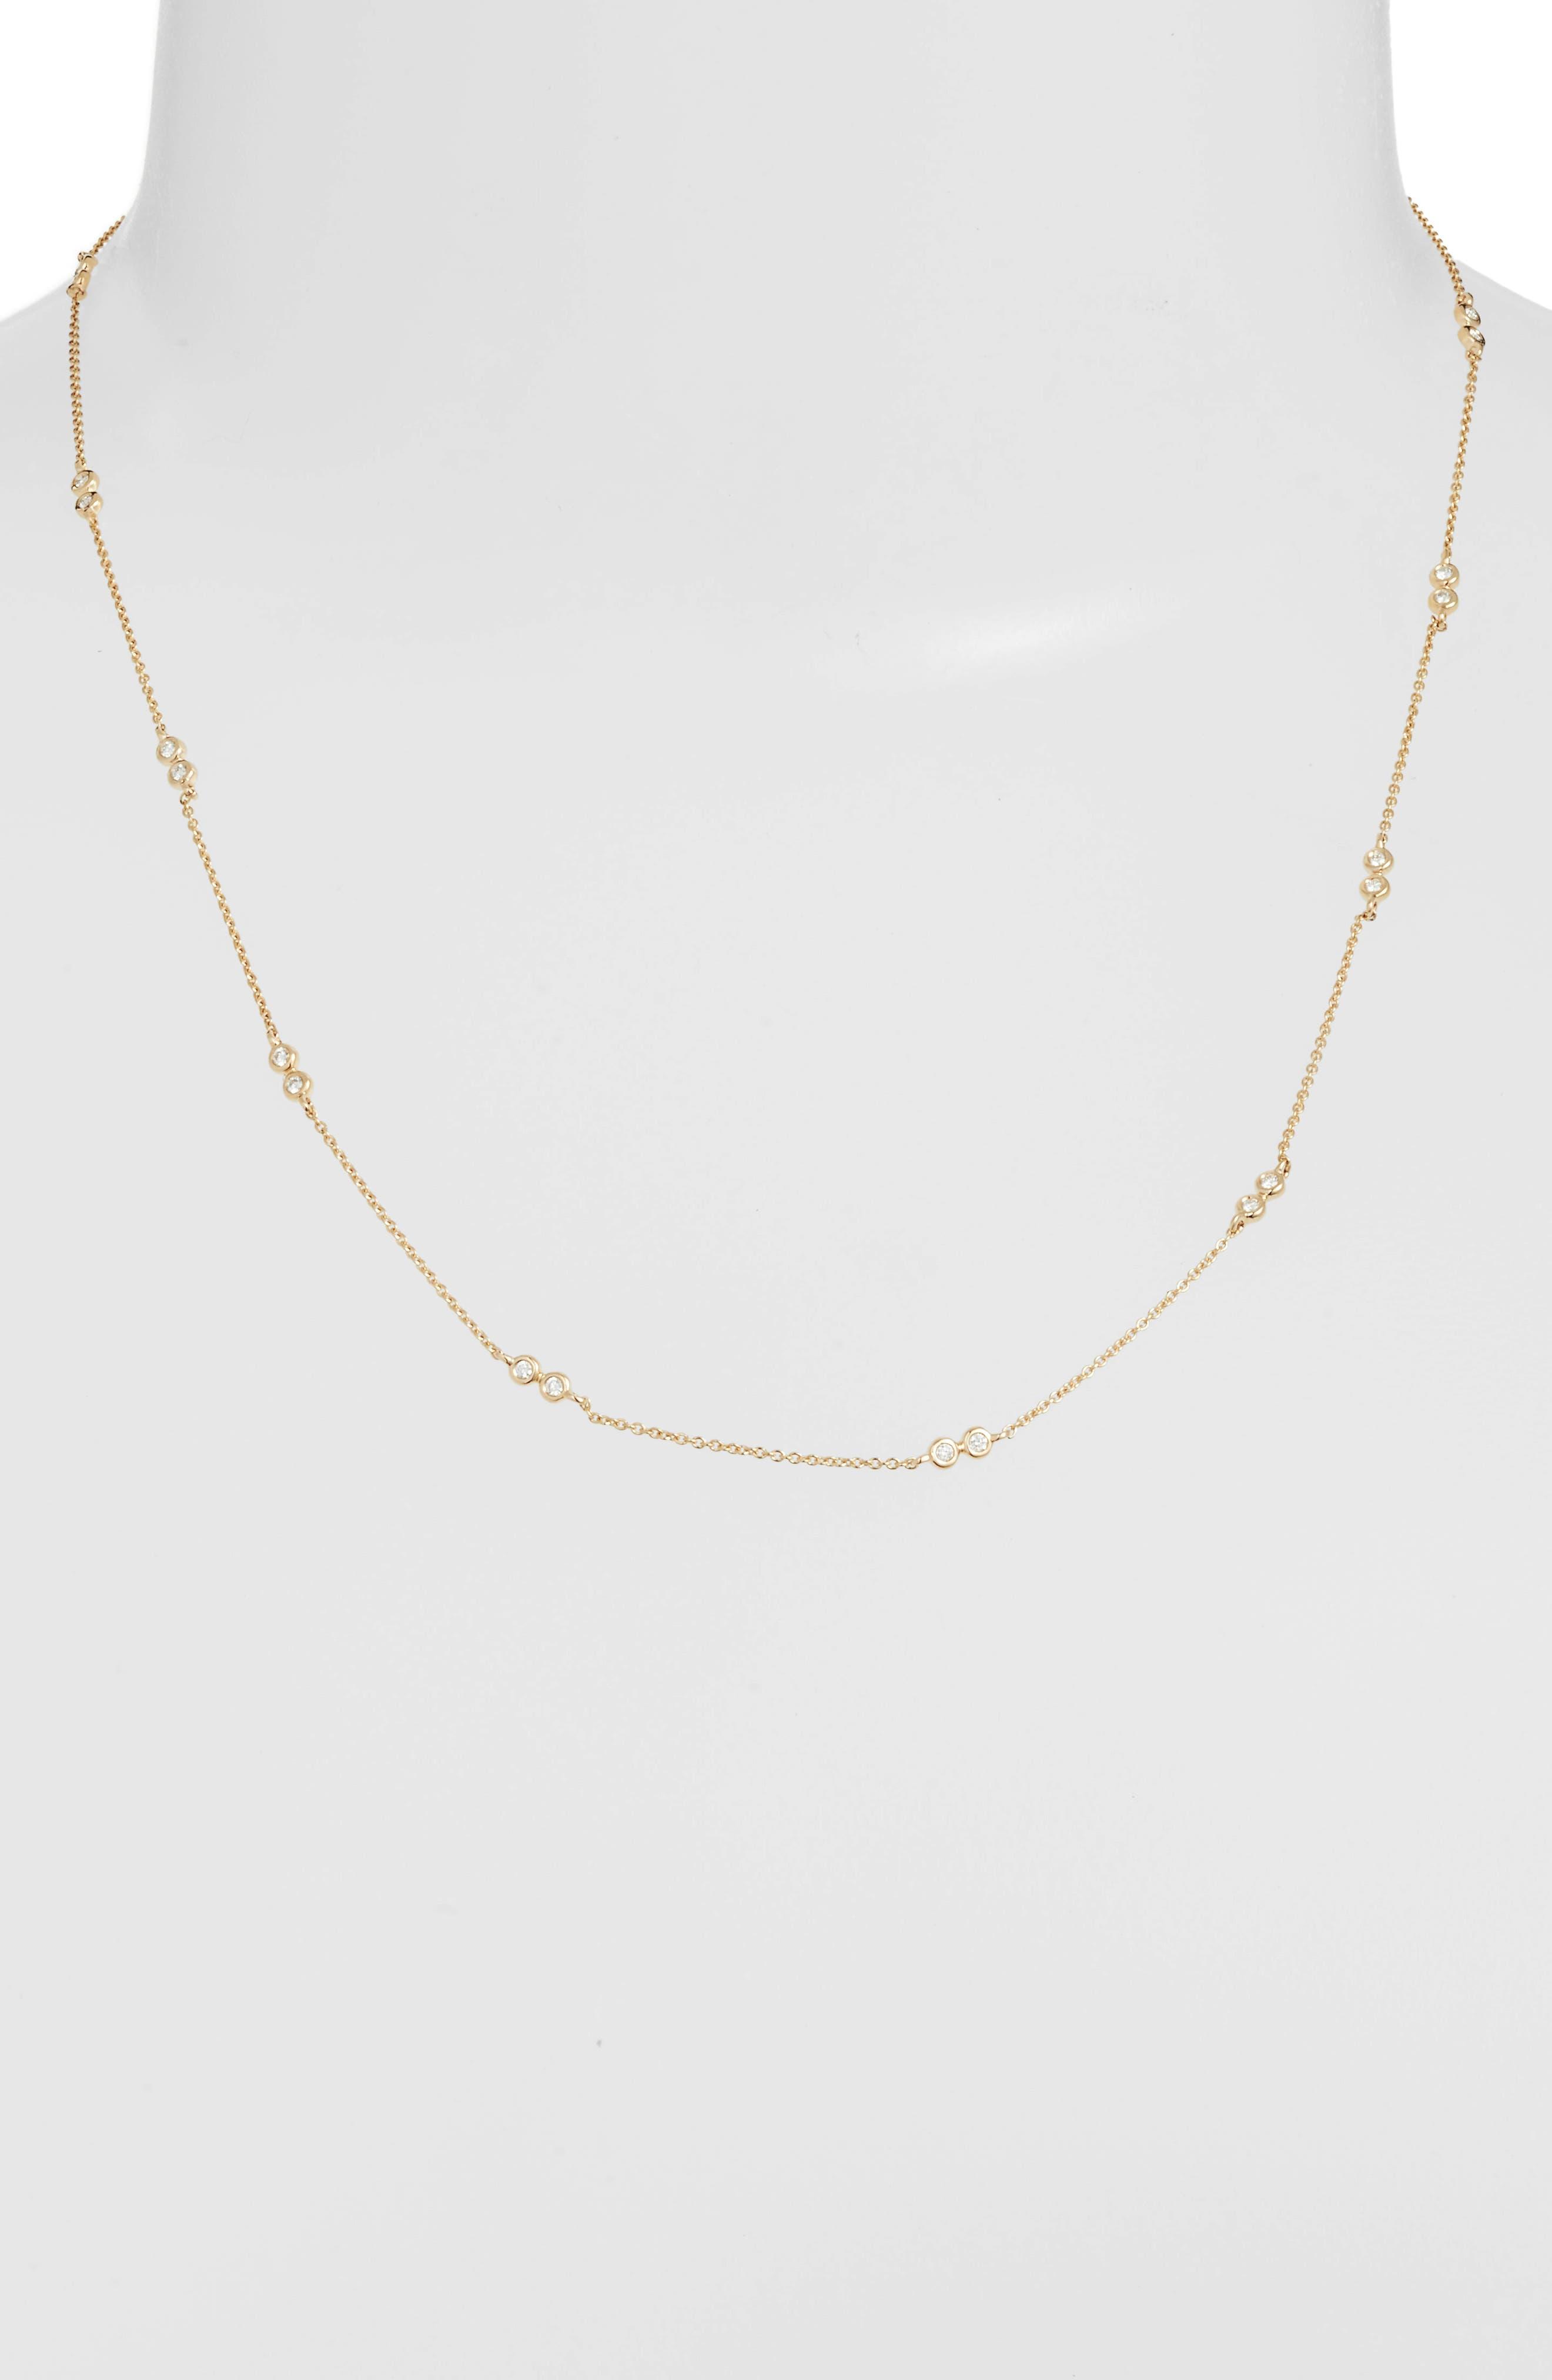 Lulu Jack Diamond Station Necklace,                             Alternate thumbnail 2, color,                             Yellow Gold